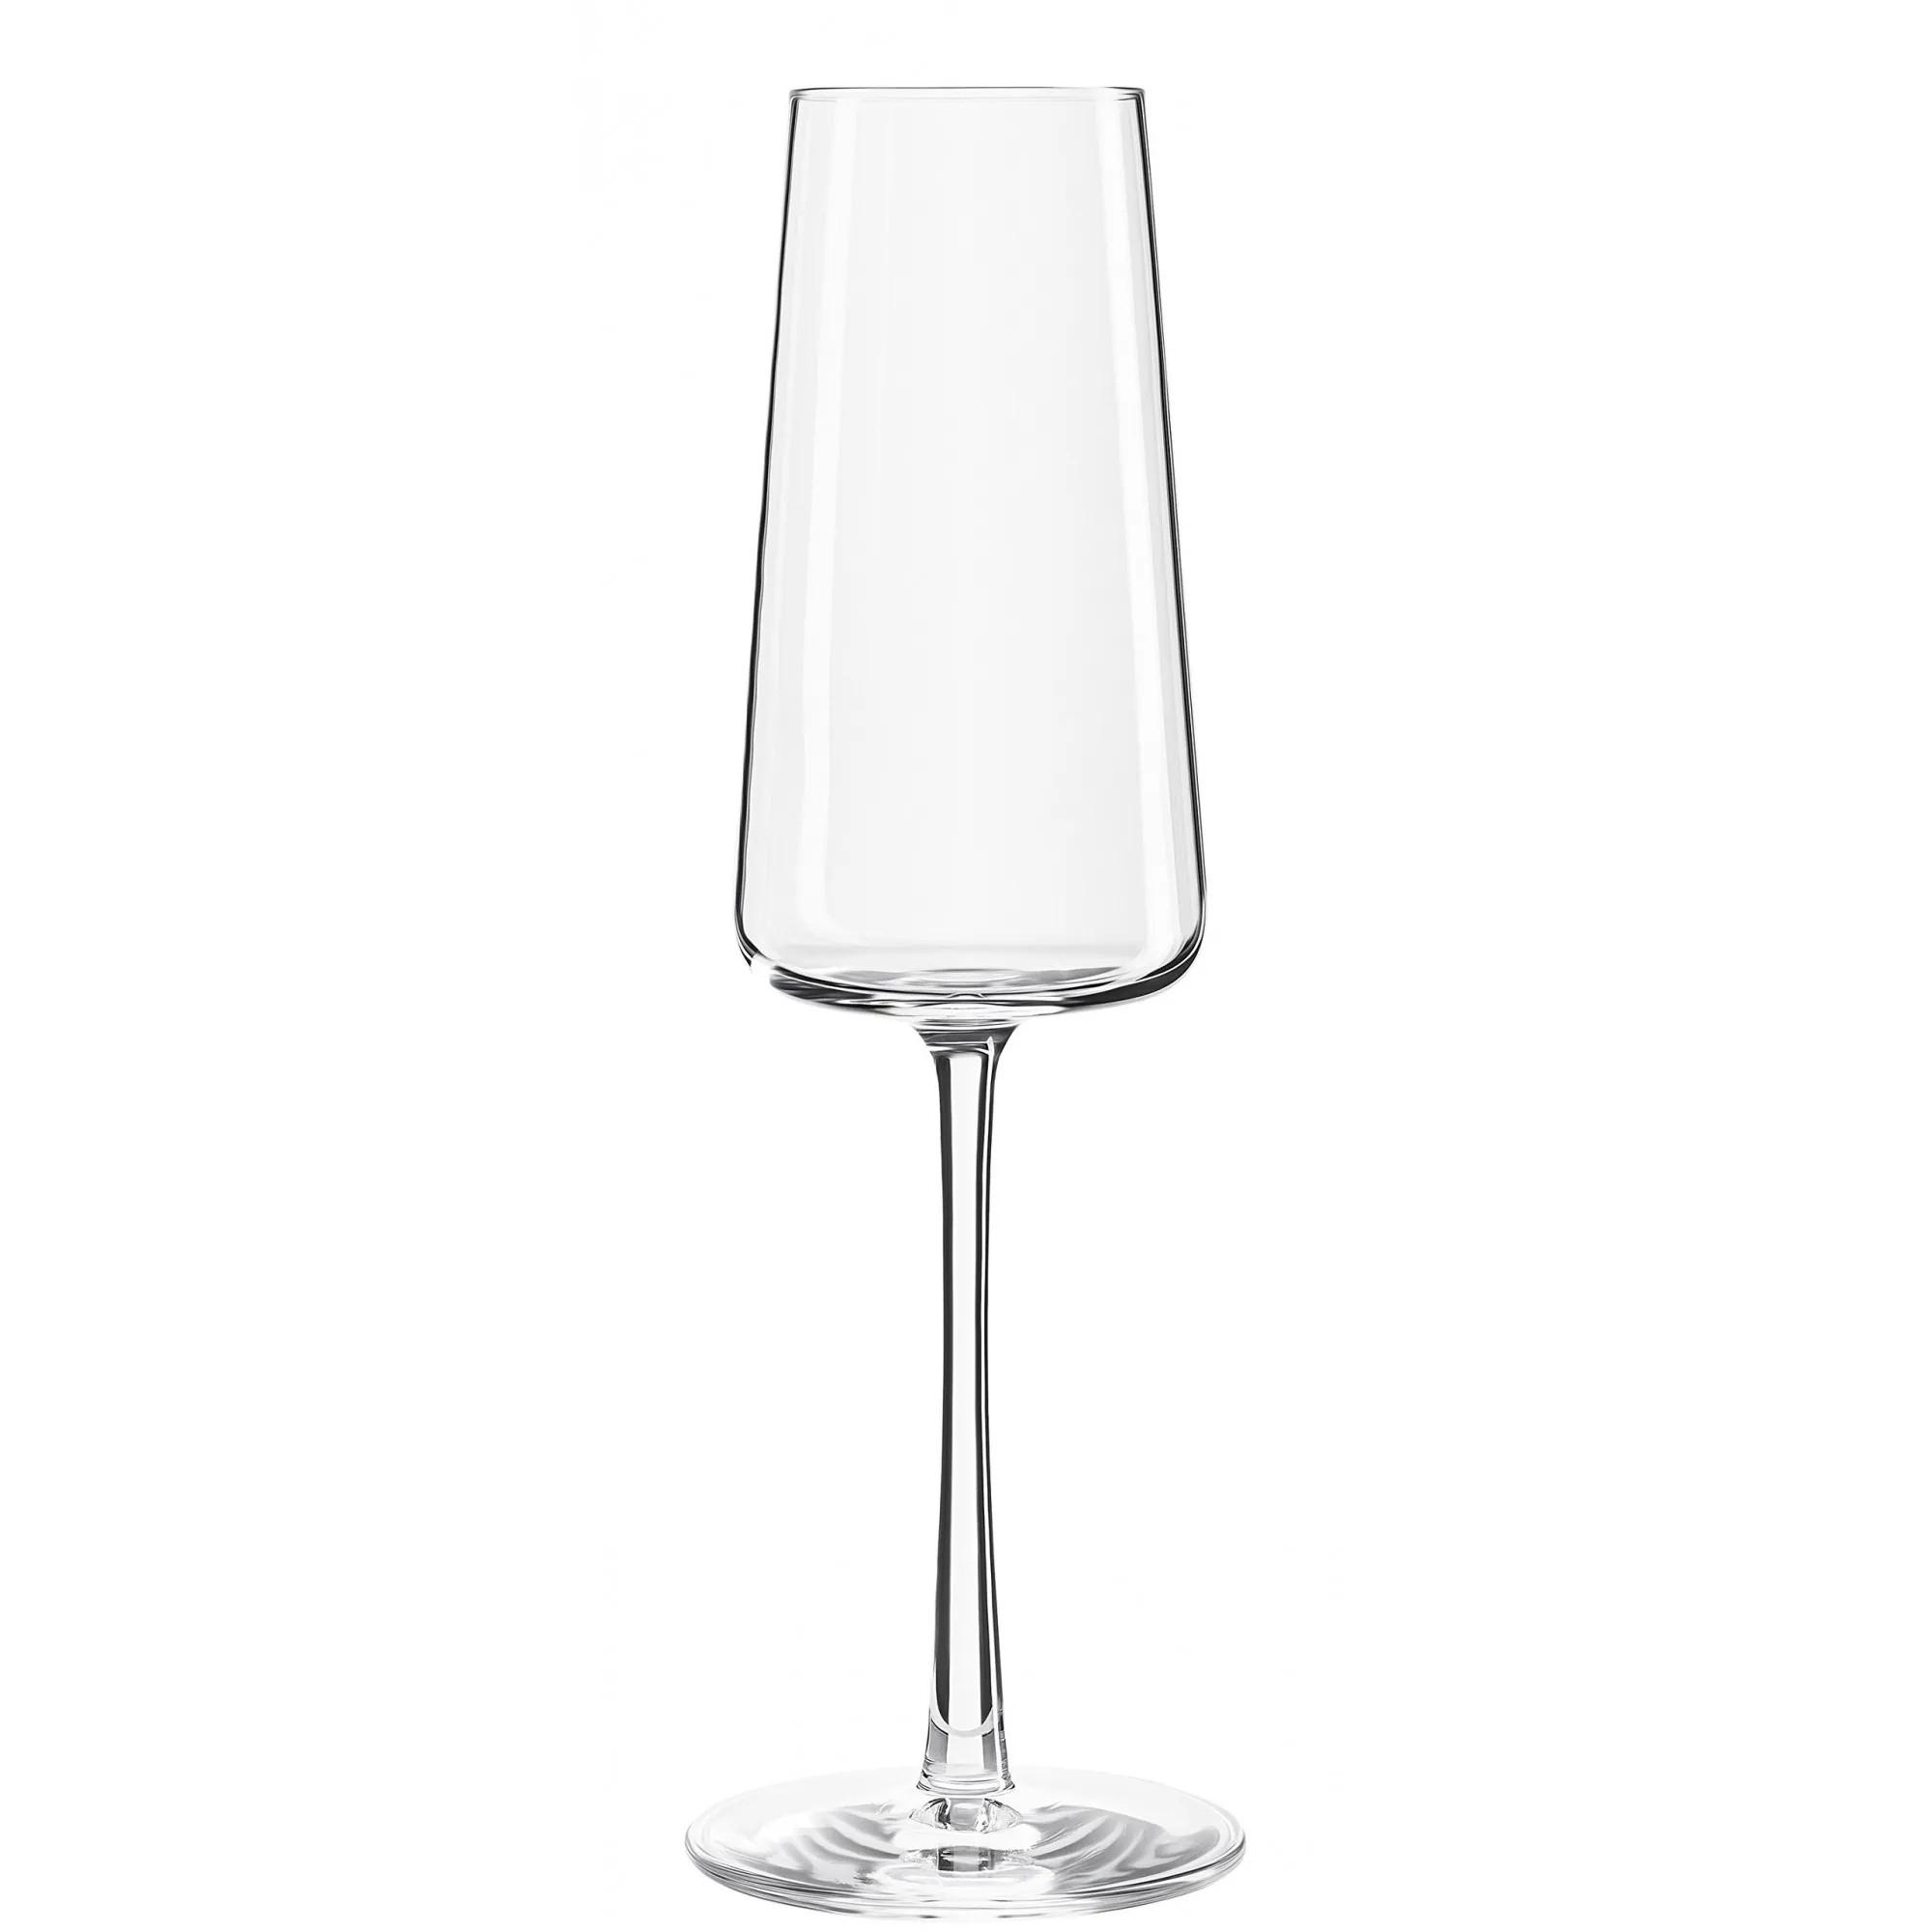 Conjunto De 06 Taças De Cristal Para Champagne/Prosecco 238Ml Linha Power Stölzle Lausitz